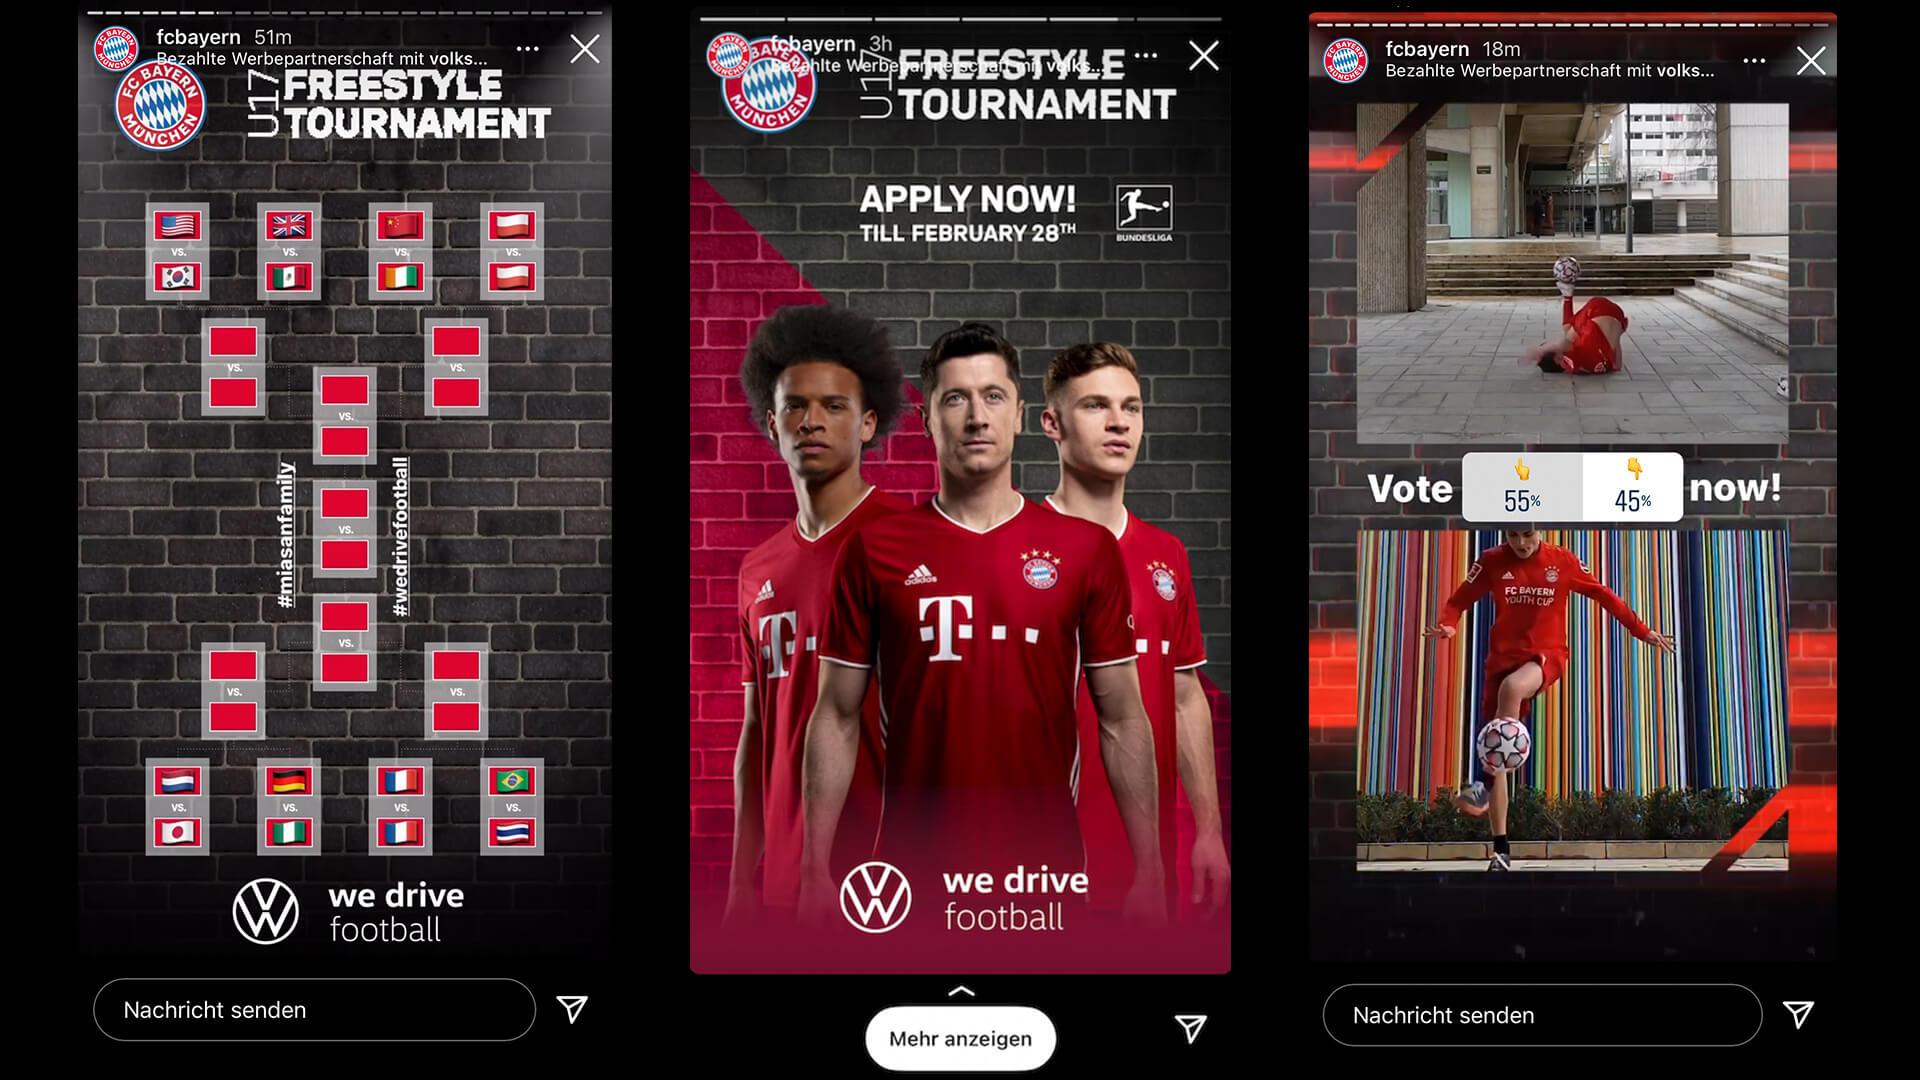 Bayern München Freestyle Social Media Contest